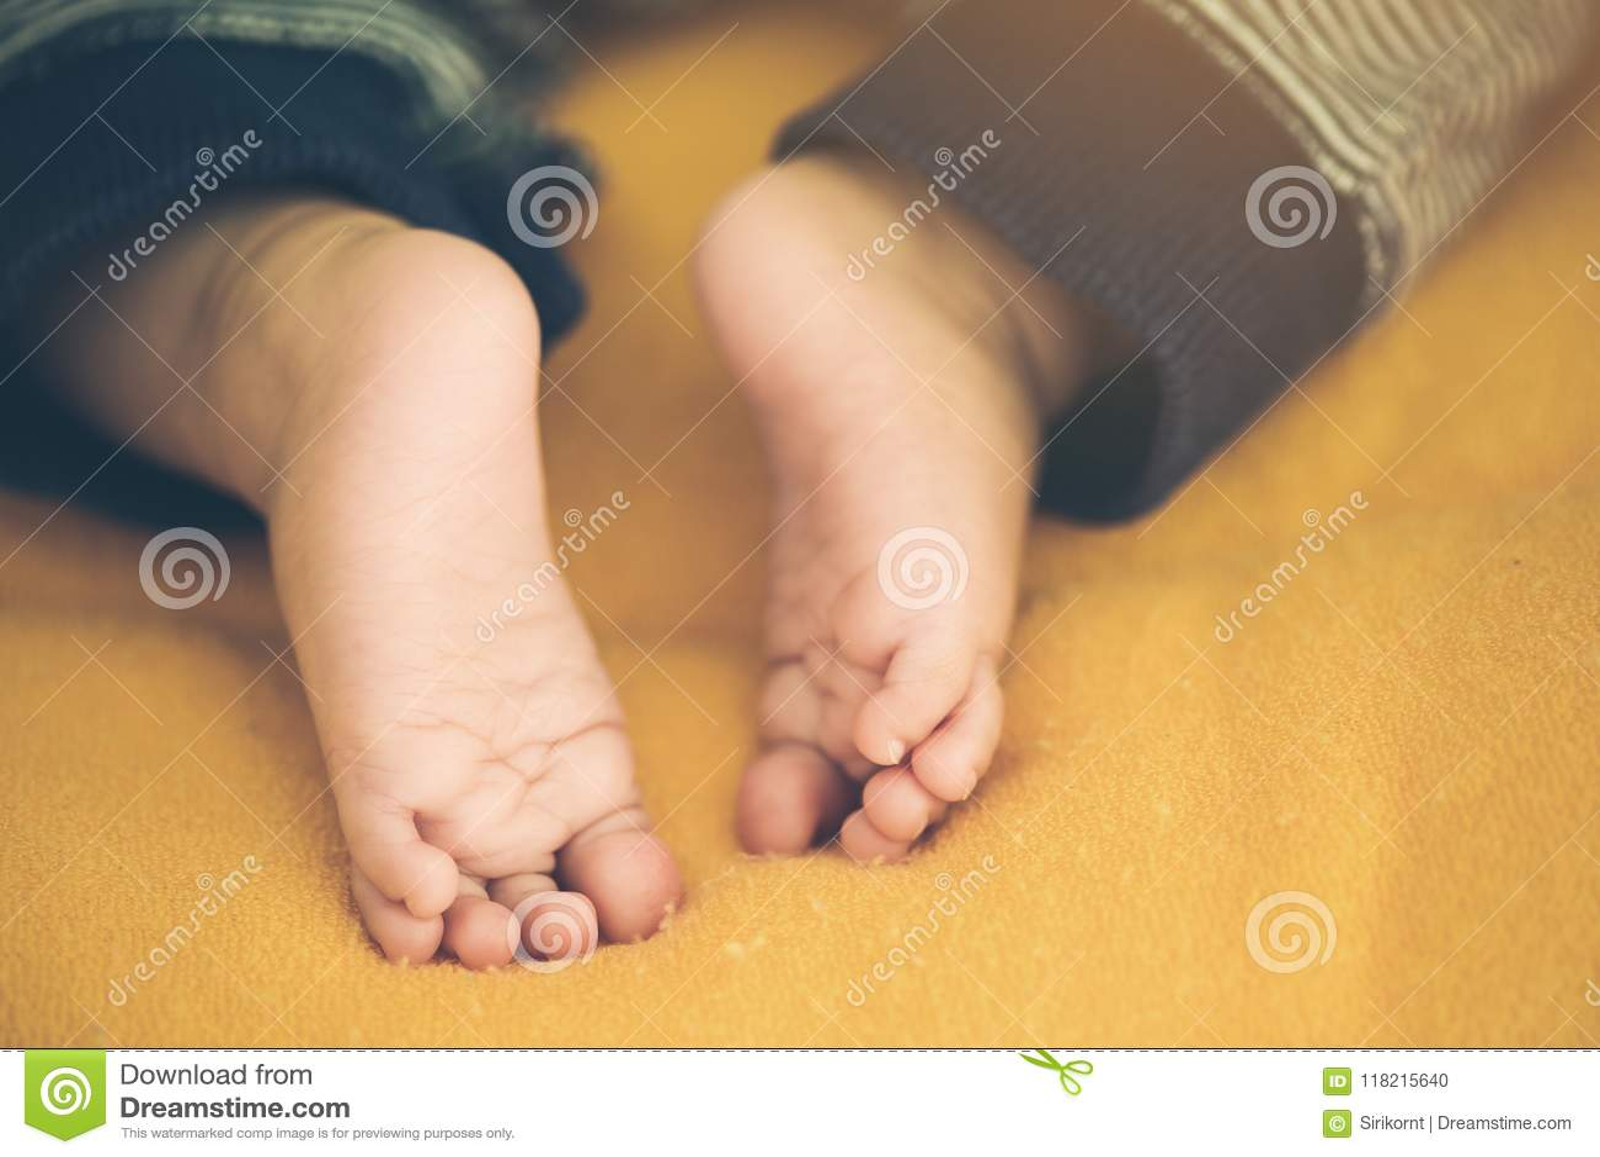 asian baby on a white blanket - tiny baby feet closeup stock photo